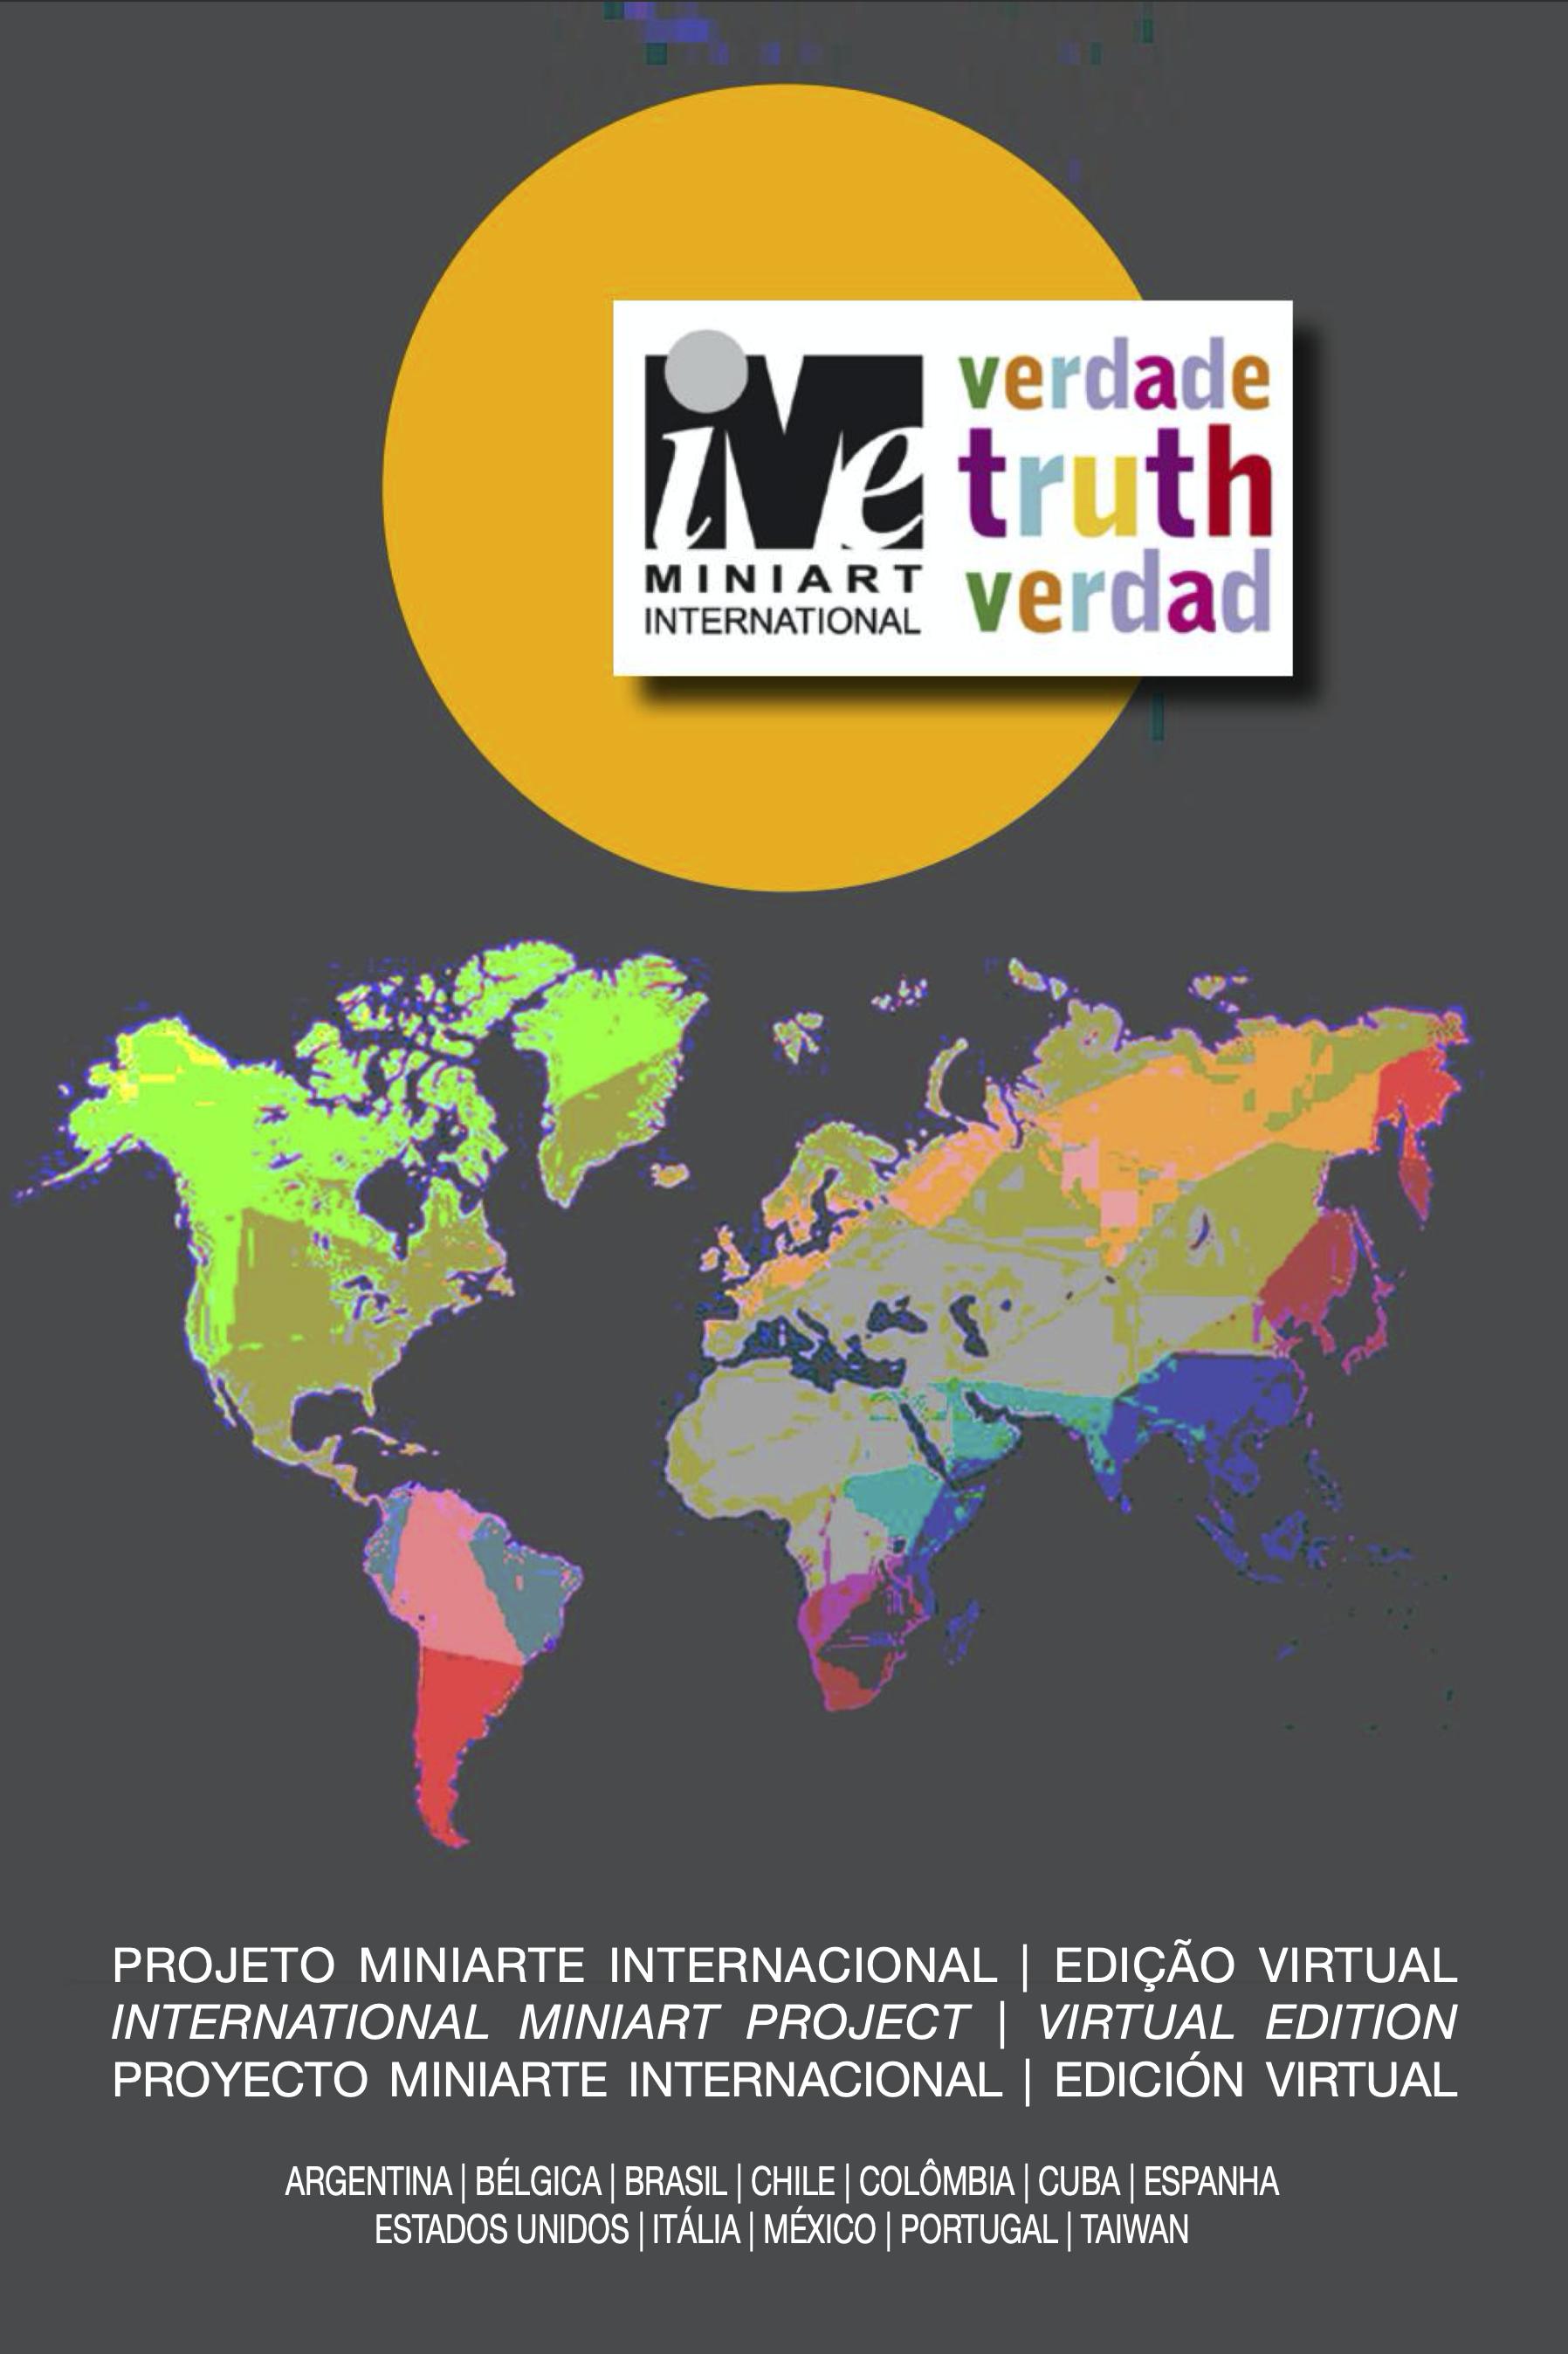 2020 - Miniarte Internacional